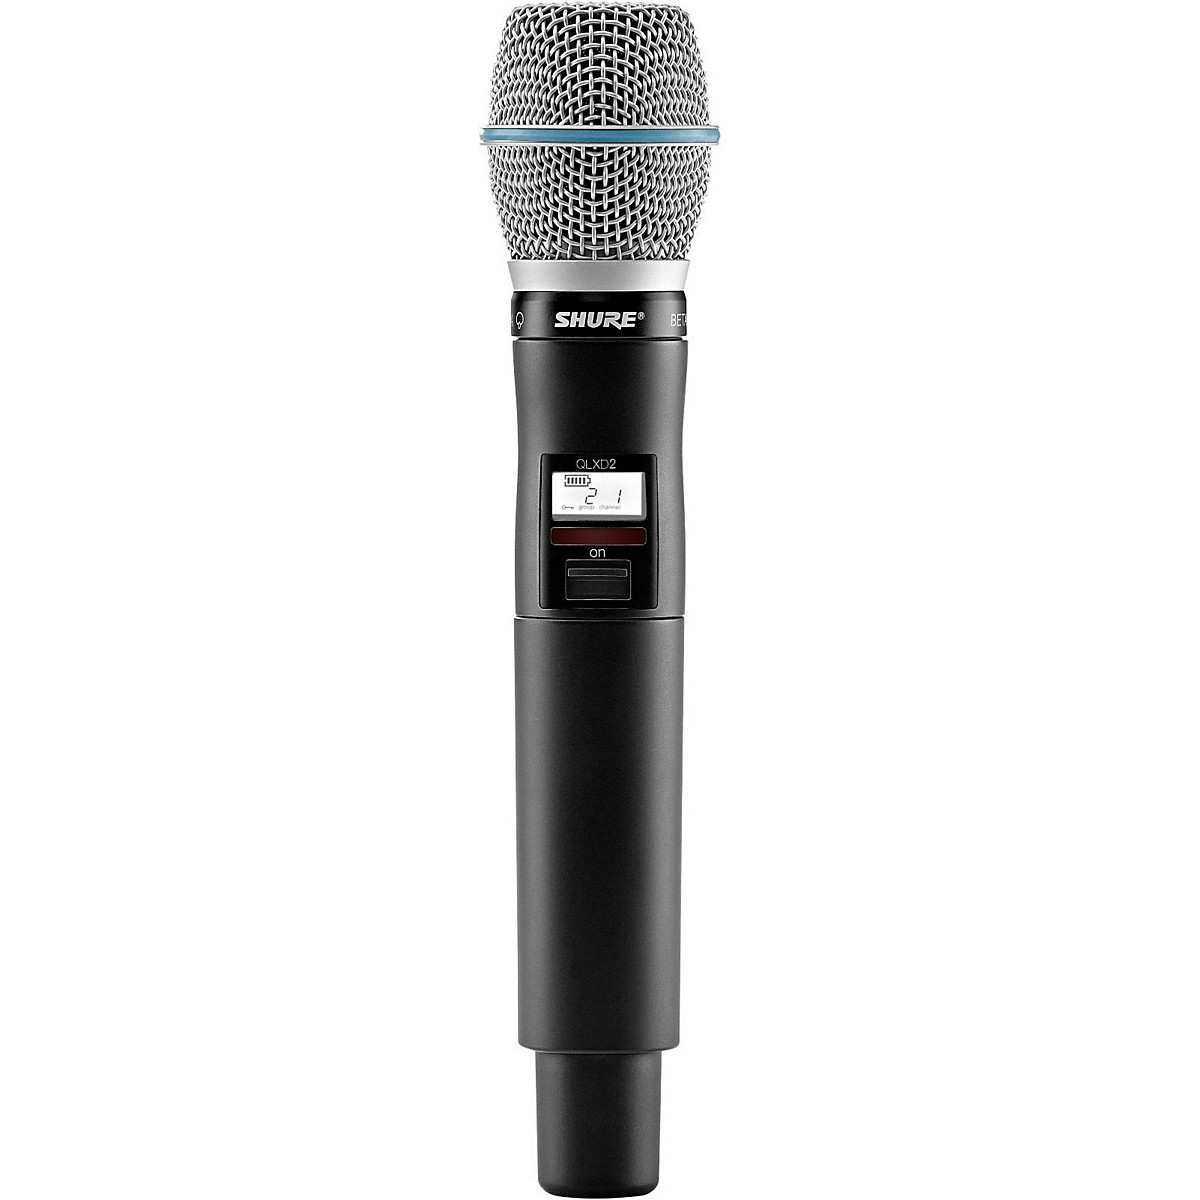 Shure QLXD2/B87C Handheld Wireless Microphone Transmitter